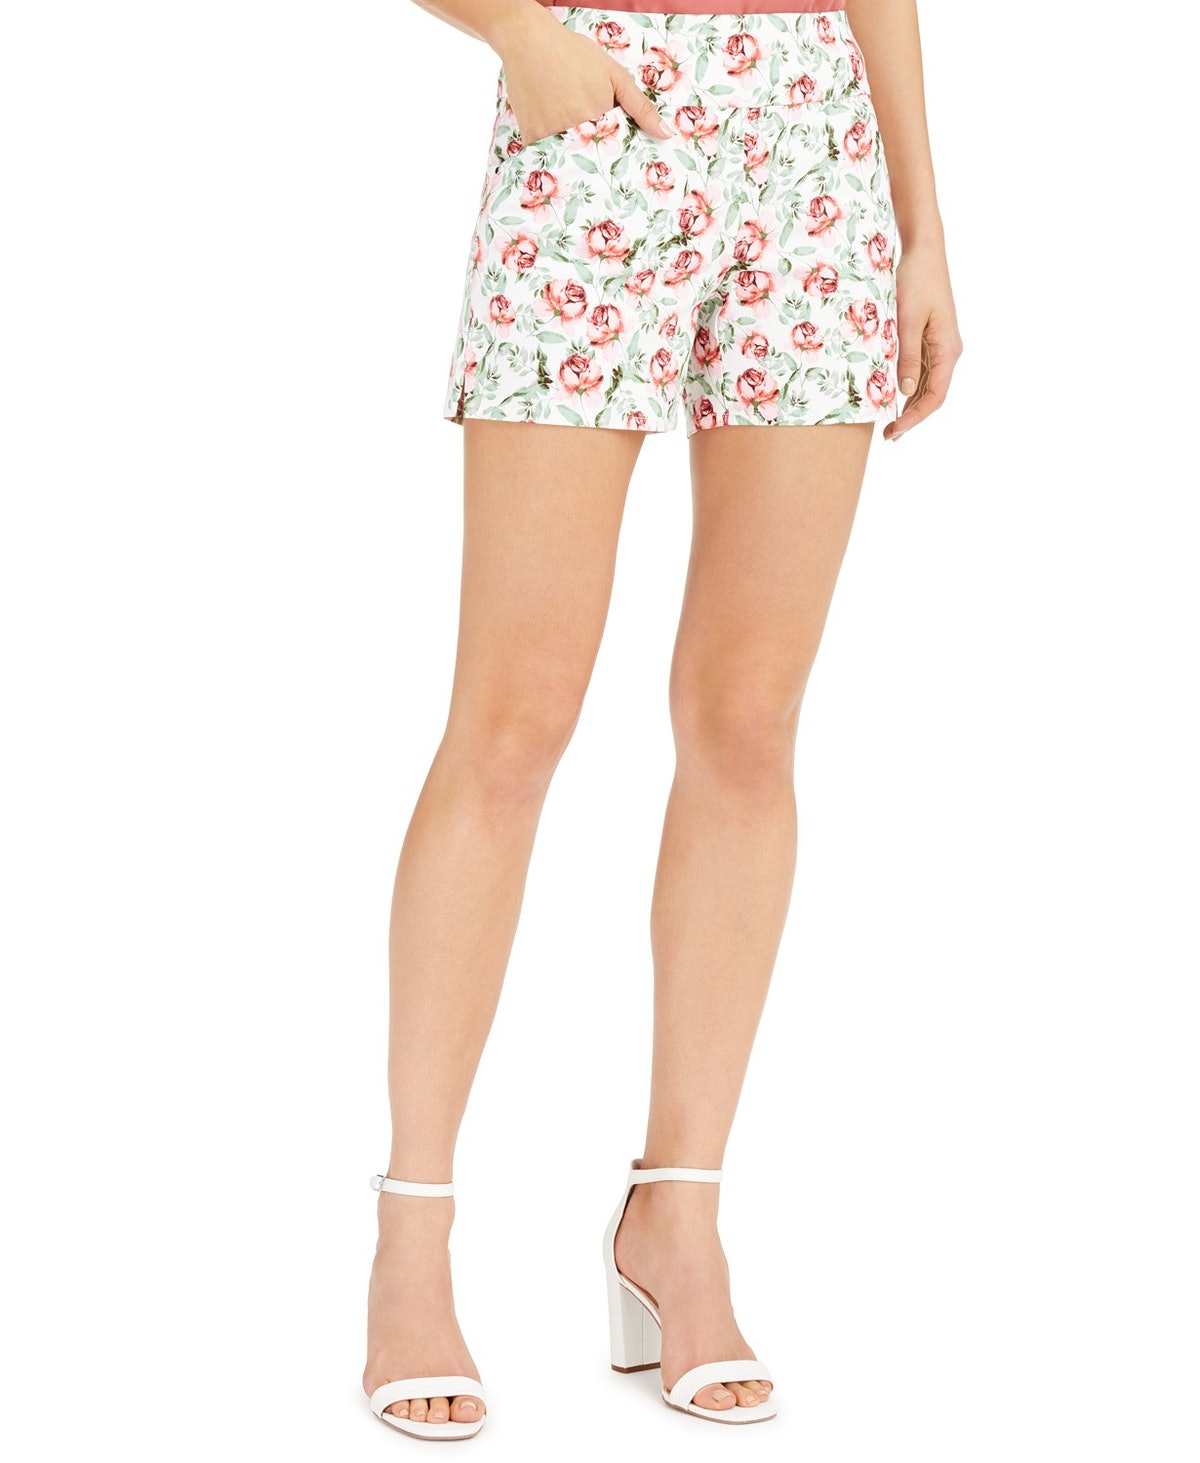 INC Floral Shorts